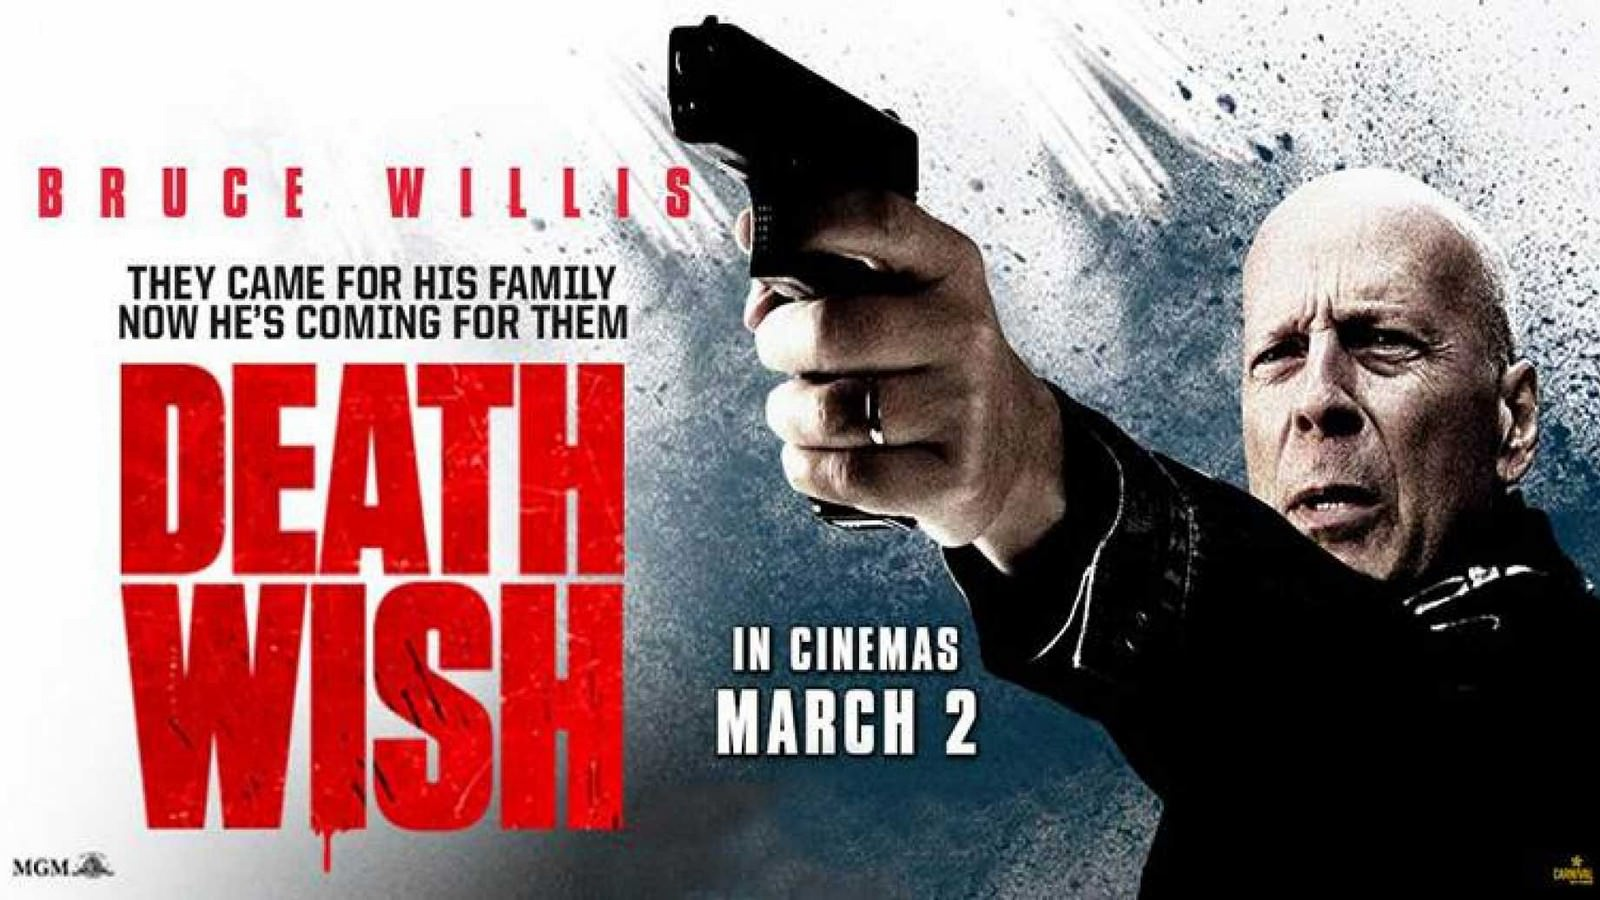 Movie, Death Wish(美國) / 猛龍怪客(台) / 虎膽追兇(港), 電影海報, 美國, 橫版